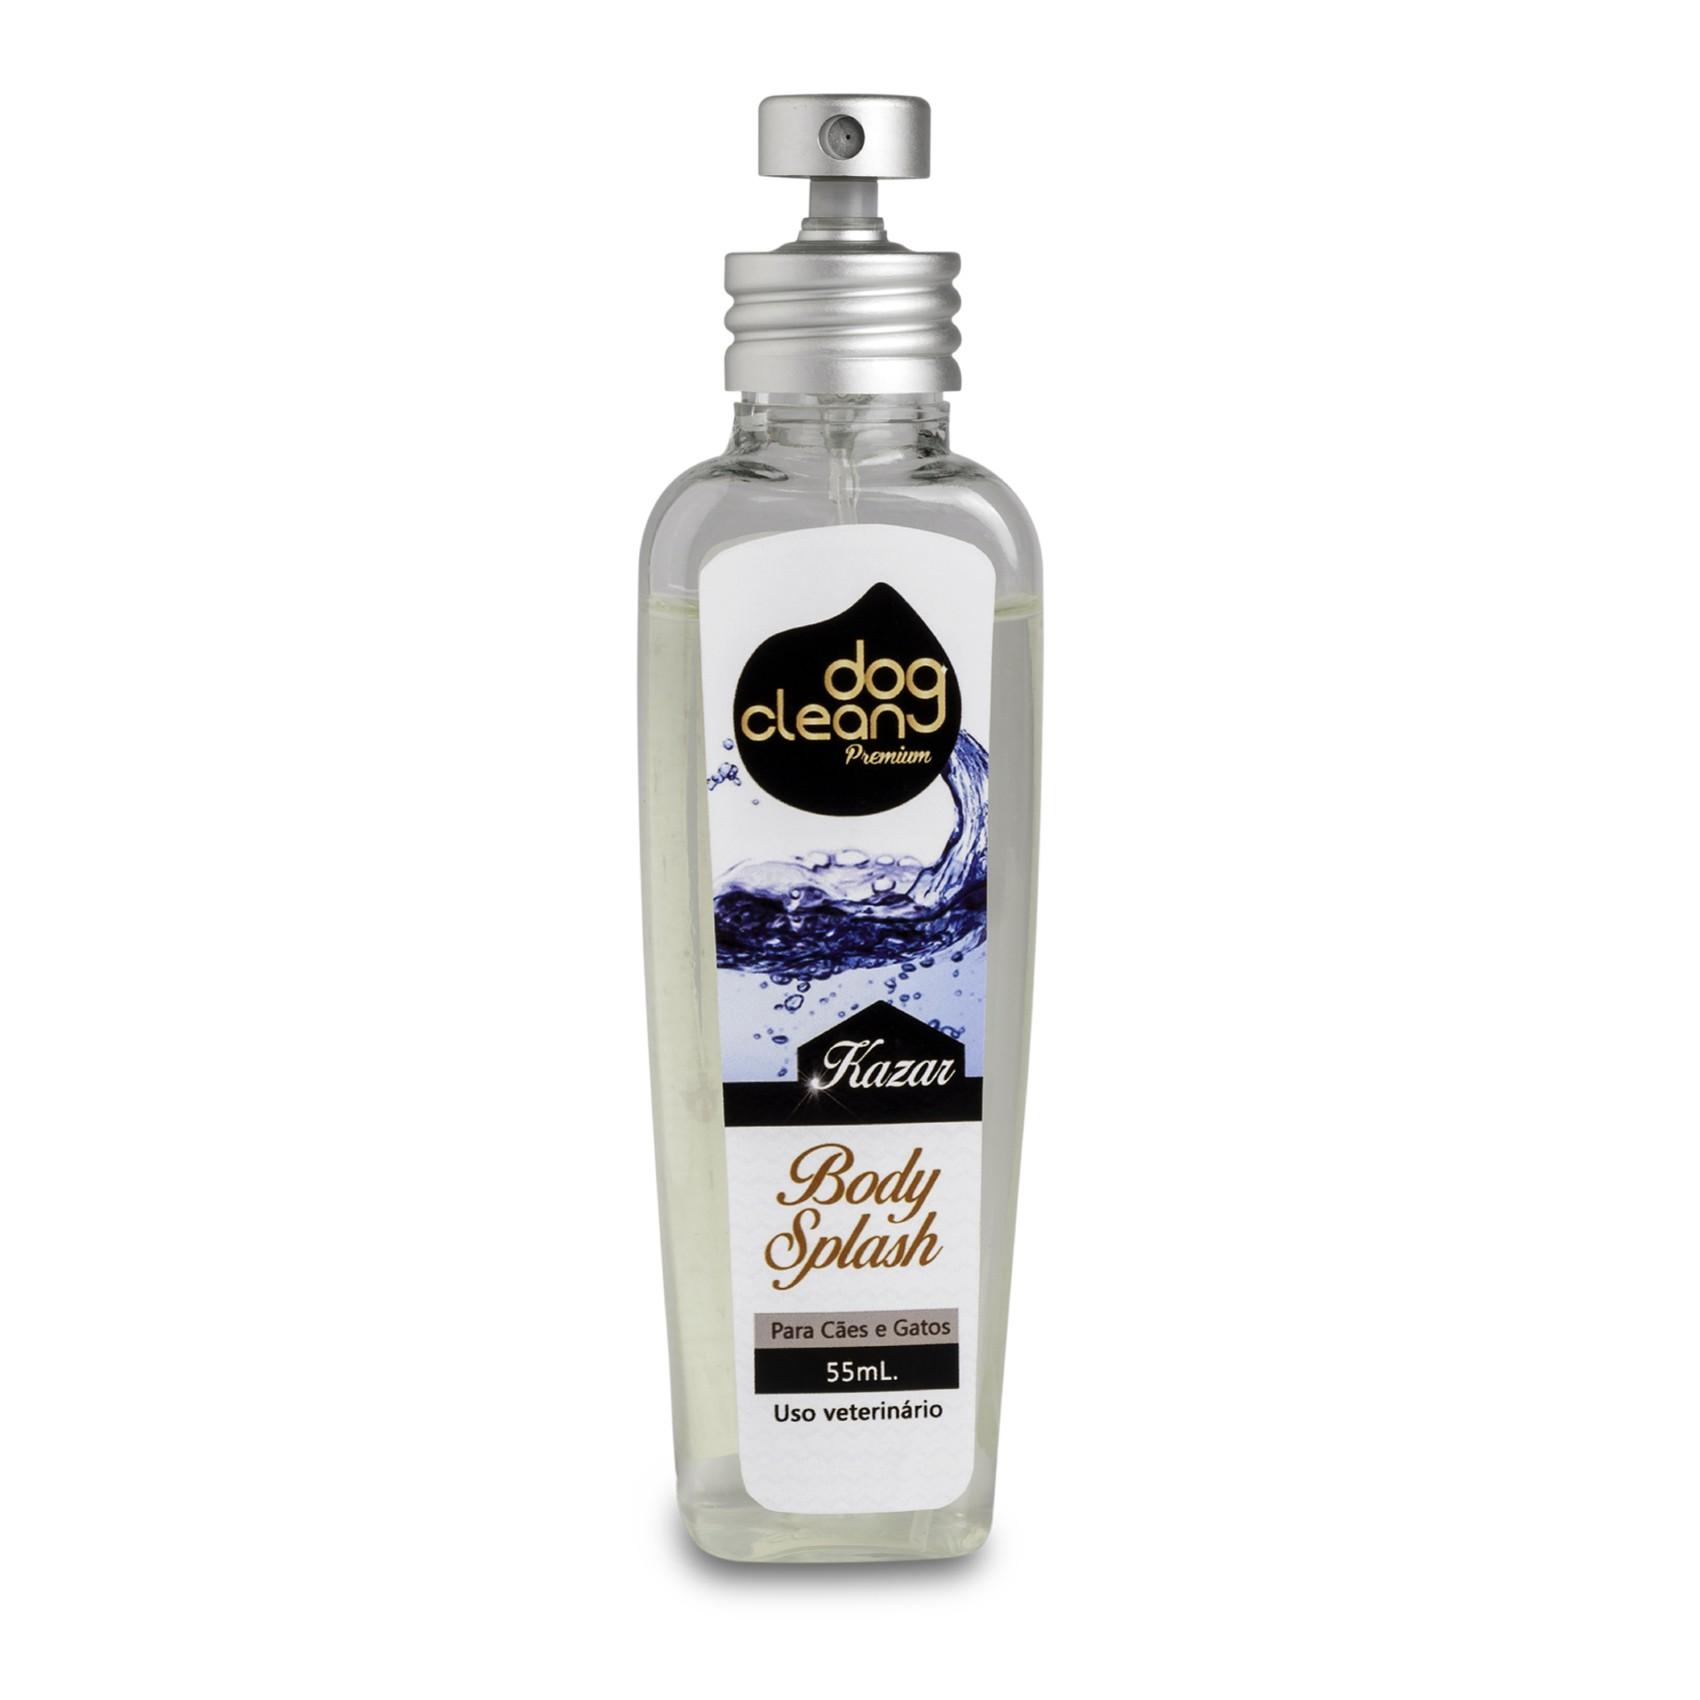 Perfume Body Splash Kazar 55ml Dog Clean